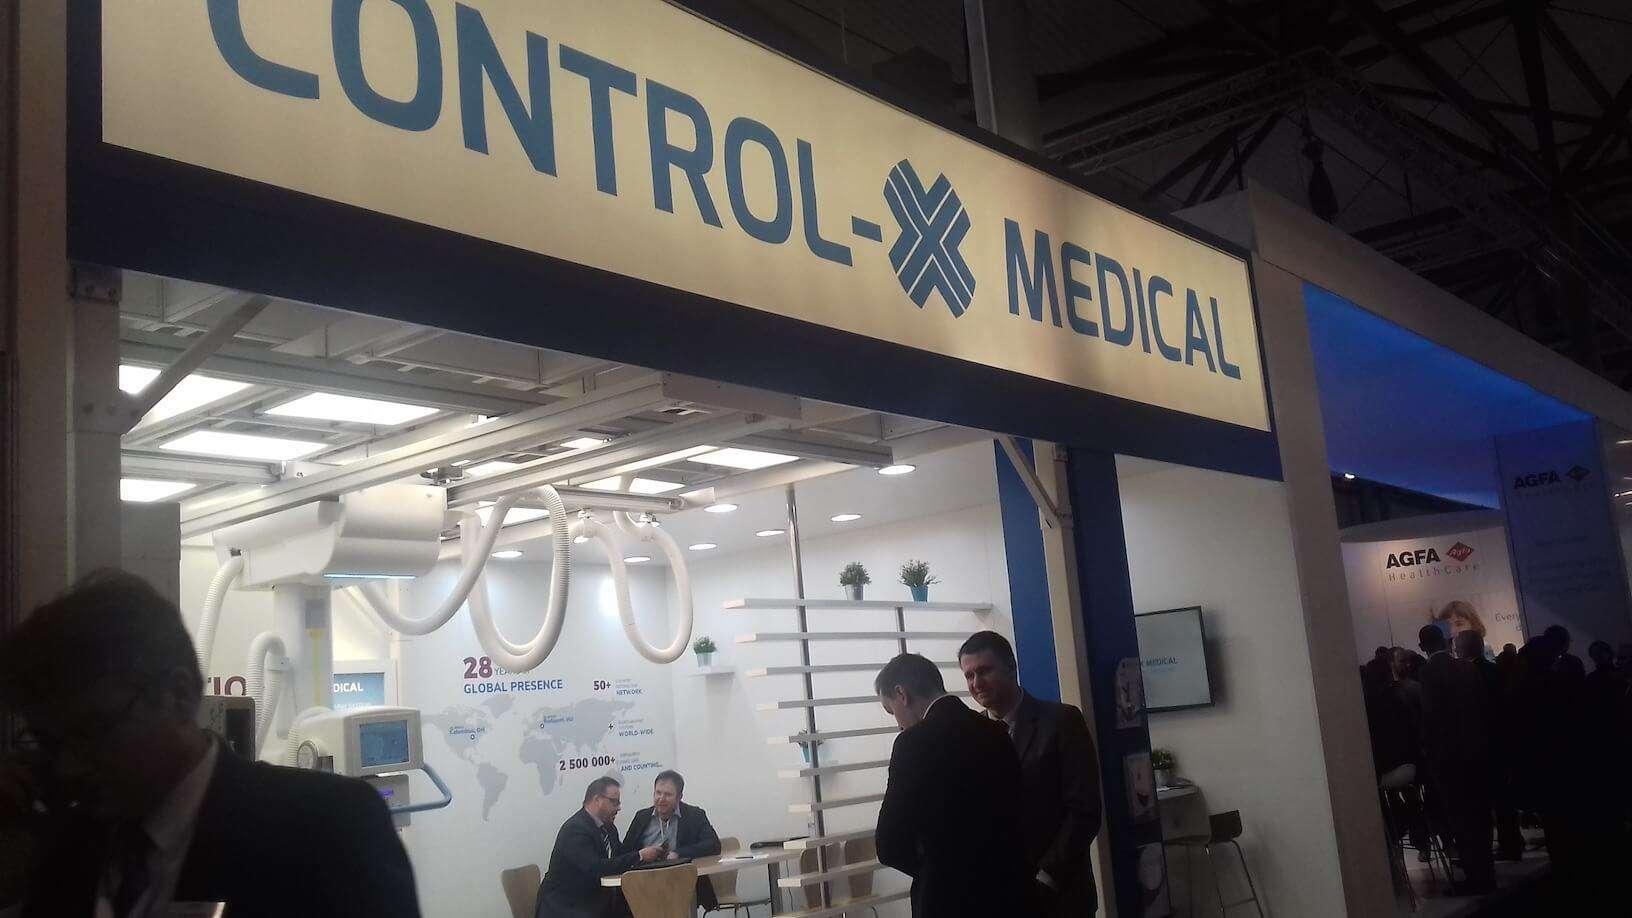 Control-X Medical micromil Micromil visita European Congress of Radiology em Viena de Áustria control x medical